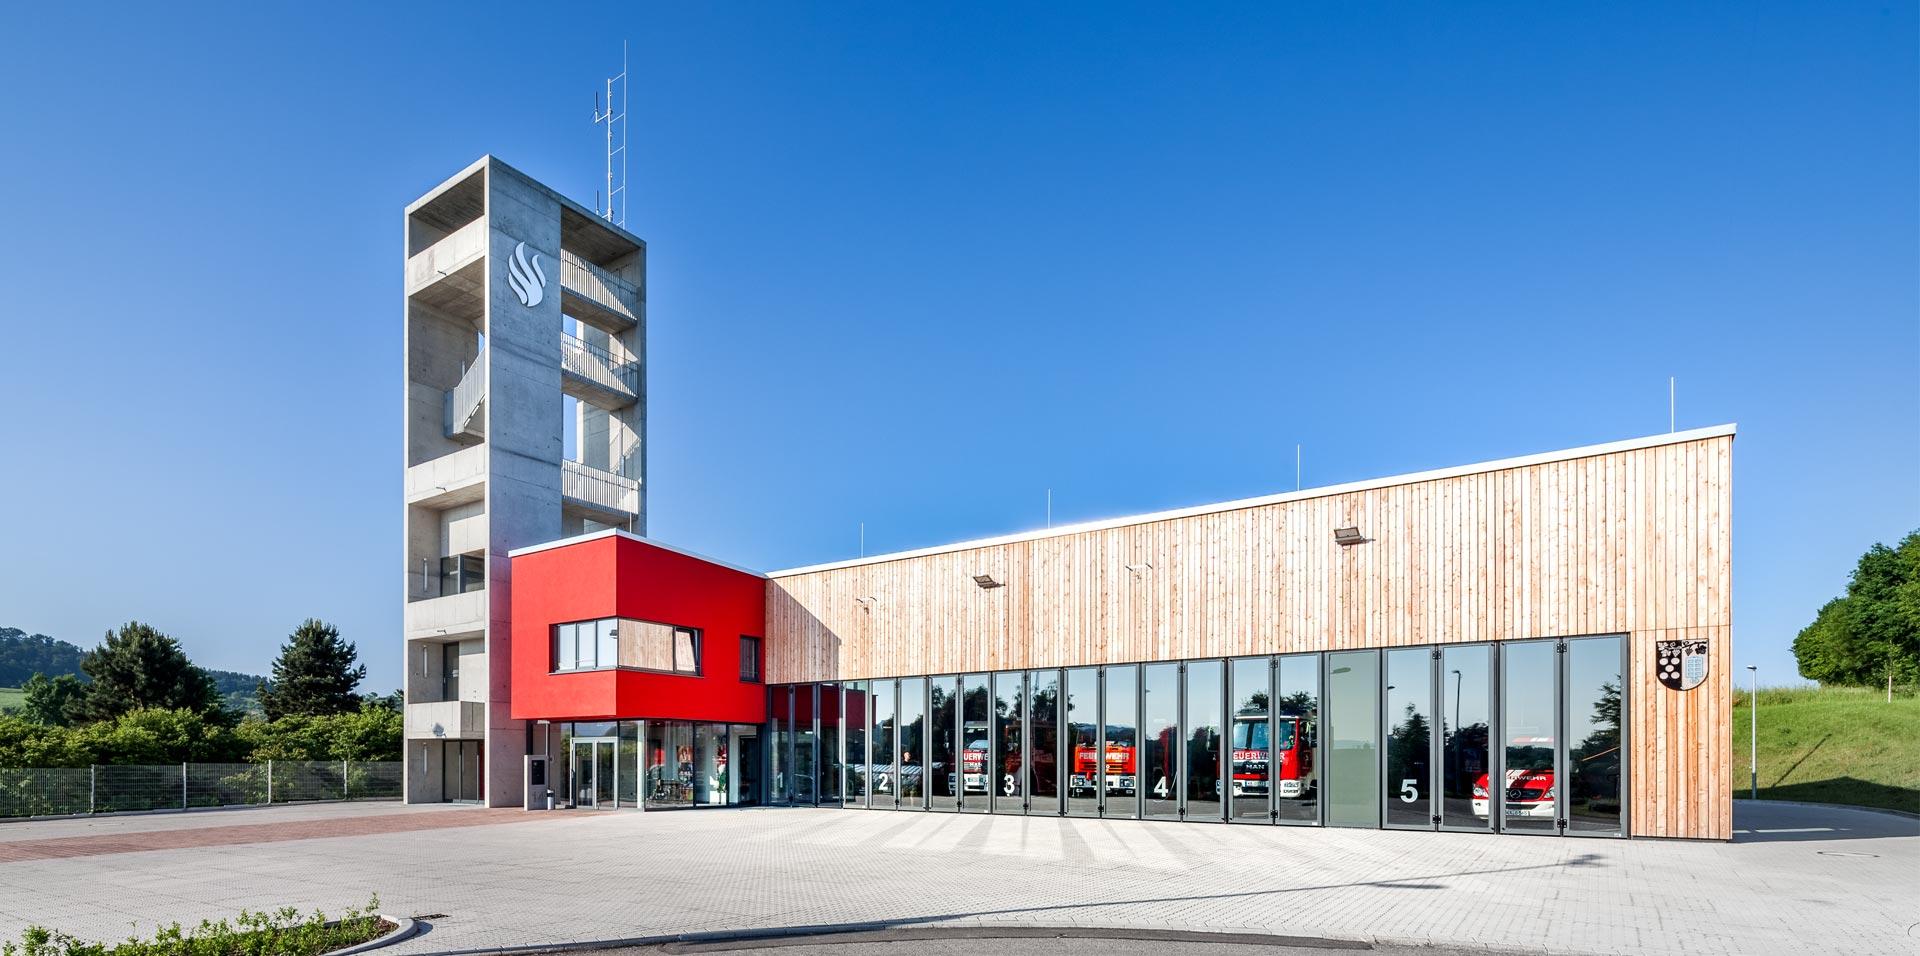 DVA-Feuerwehrhaus-Oberderdingen_energieberatung-gossner_Daniel Vieser . Architekturfotografie, Karlsruhe